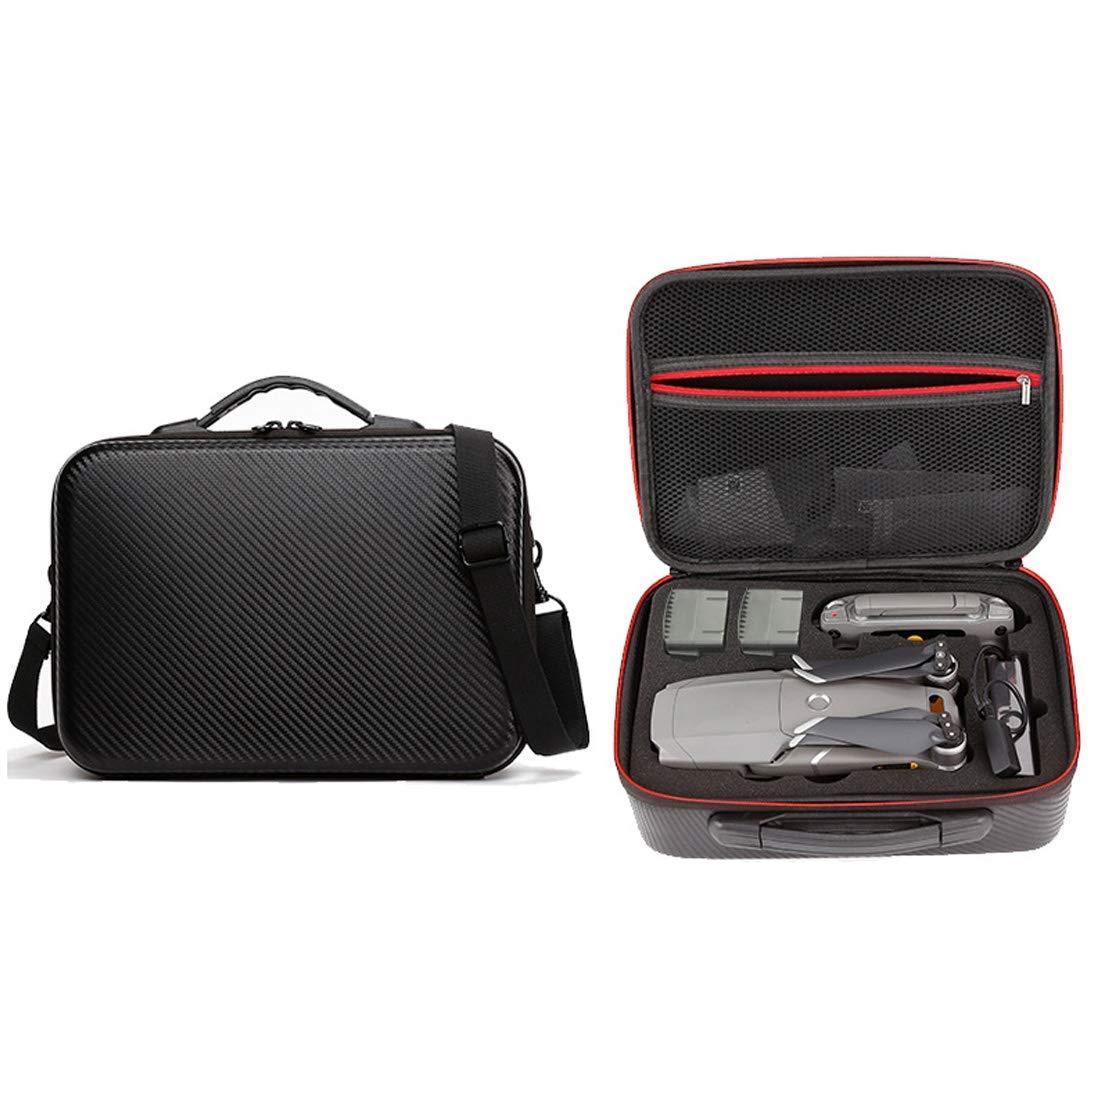 ZQ House Portable Double-Deck Single Shoulder Waterproof Storage Travel Carrying Cover Case Box for DJI Mavic Air Convenient (Color : Black)